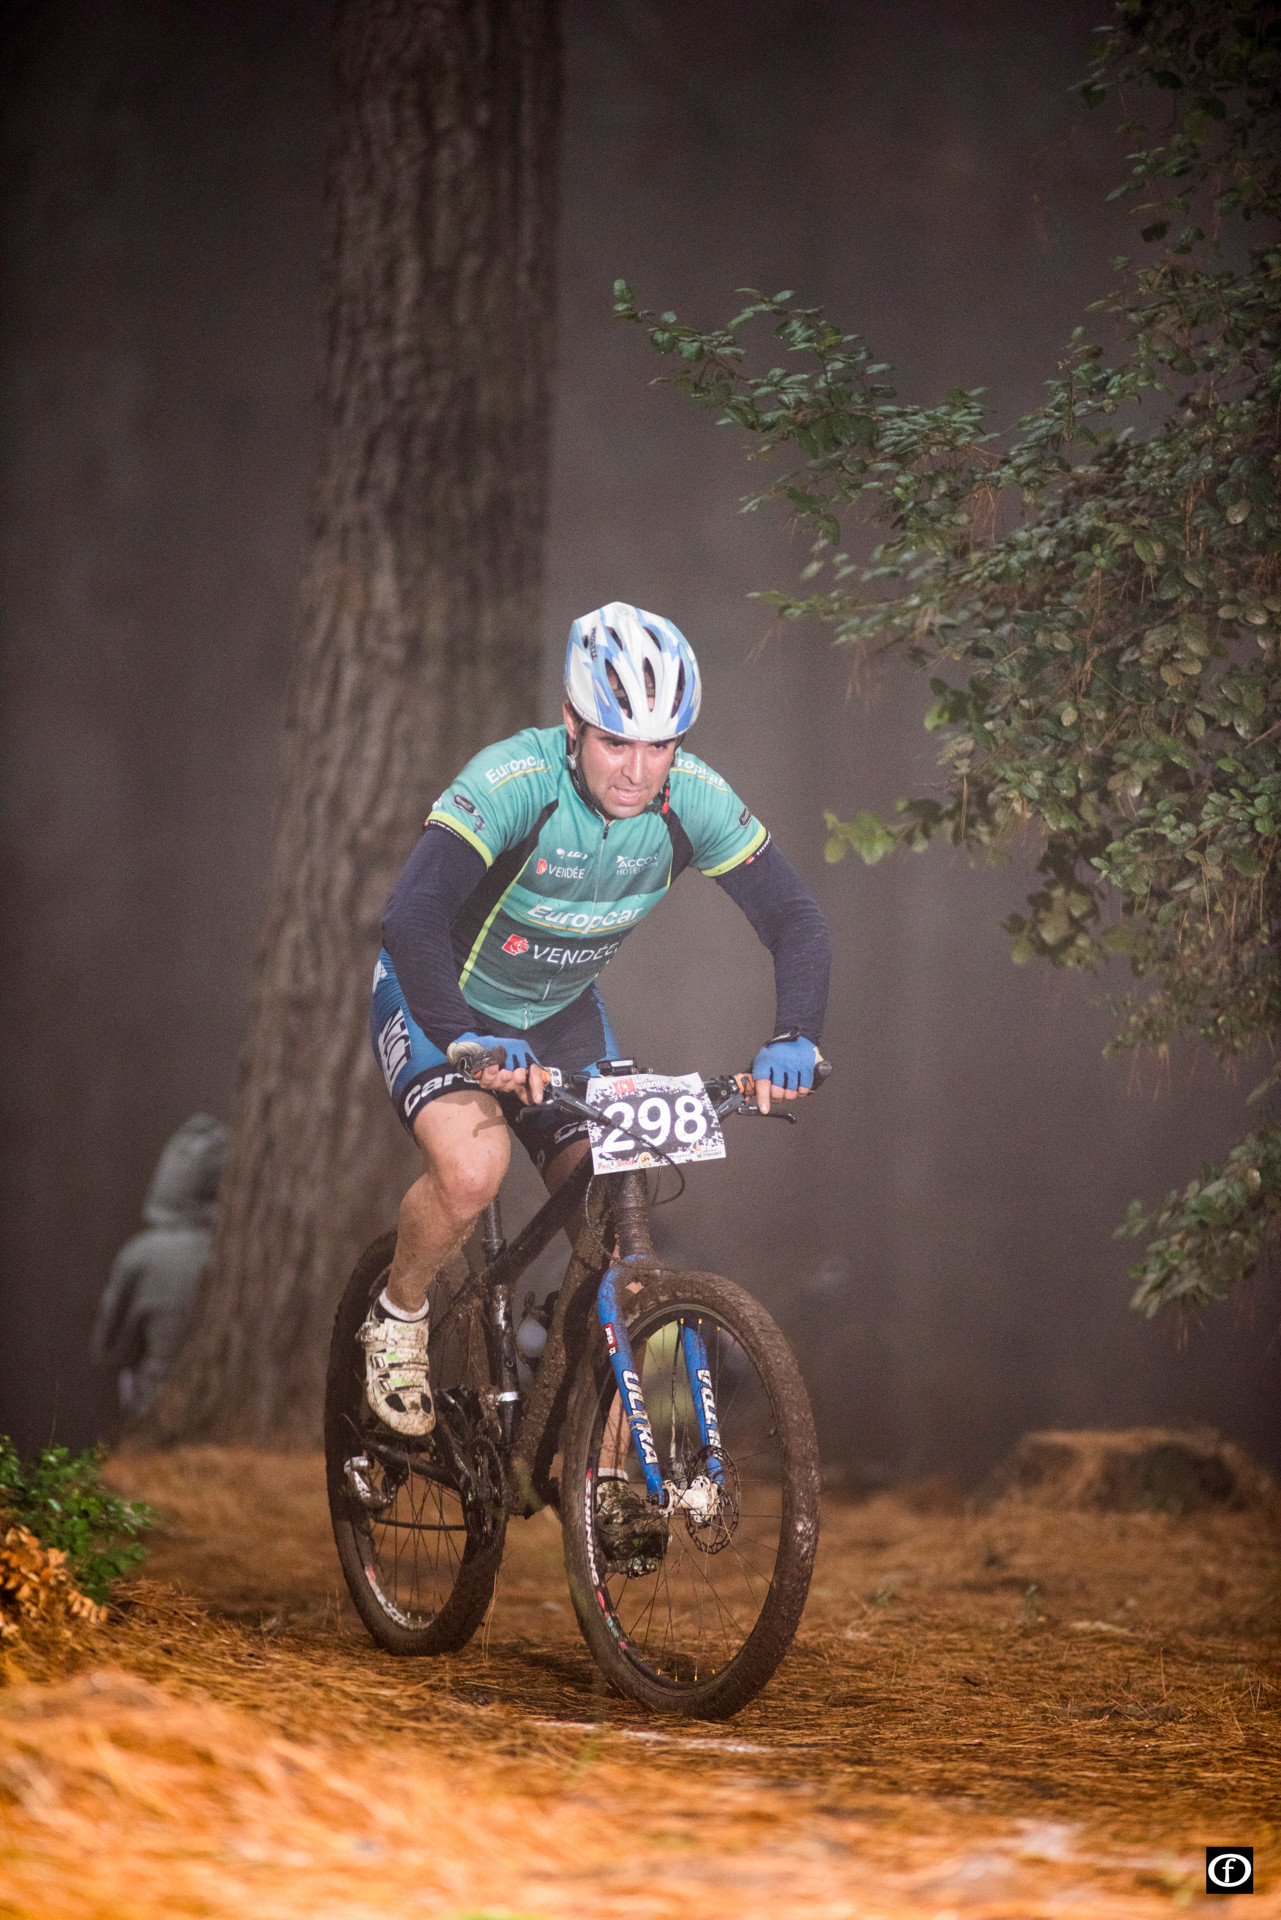 2015-05-17-Ciclismo Enduro-39.jpg